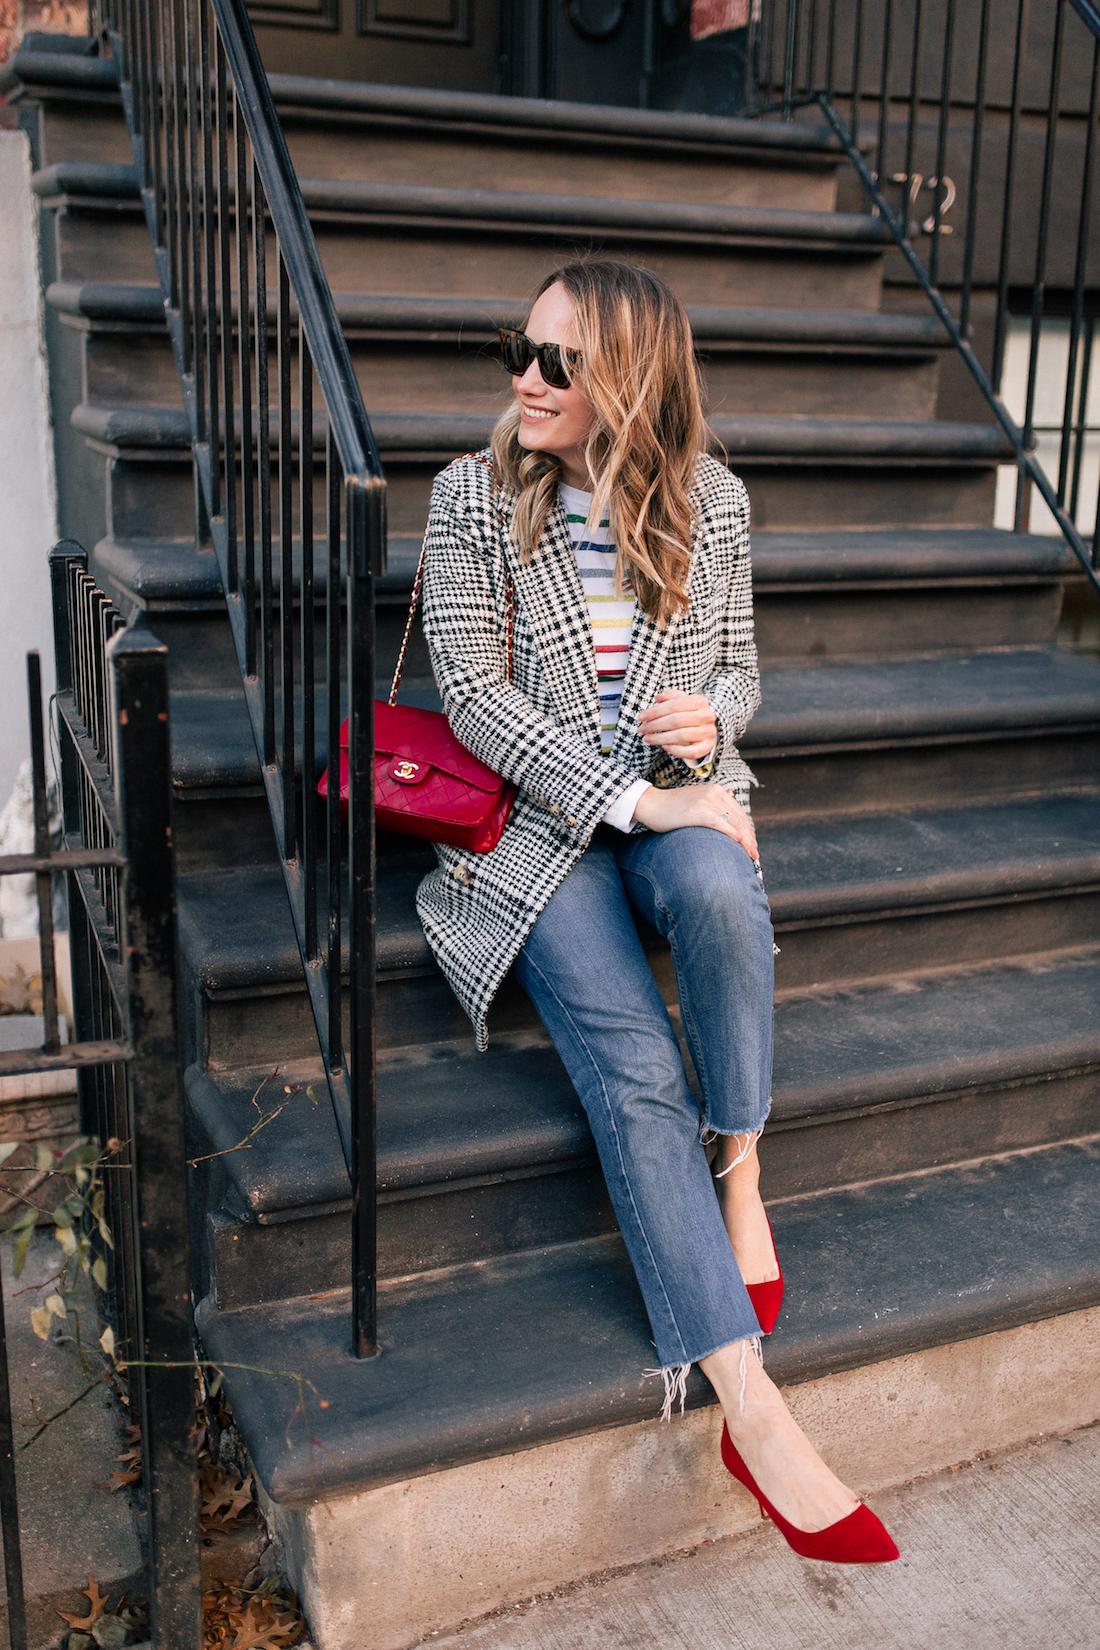 Outfit Details:Topshop Coat // Brooks Brothers Red Fleece Rainbow Sweater // Re/Done Denim // Manolo Blahnik Pumps // Vintage Chanel Purse // Celine Sunglasses(exact)